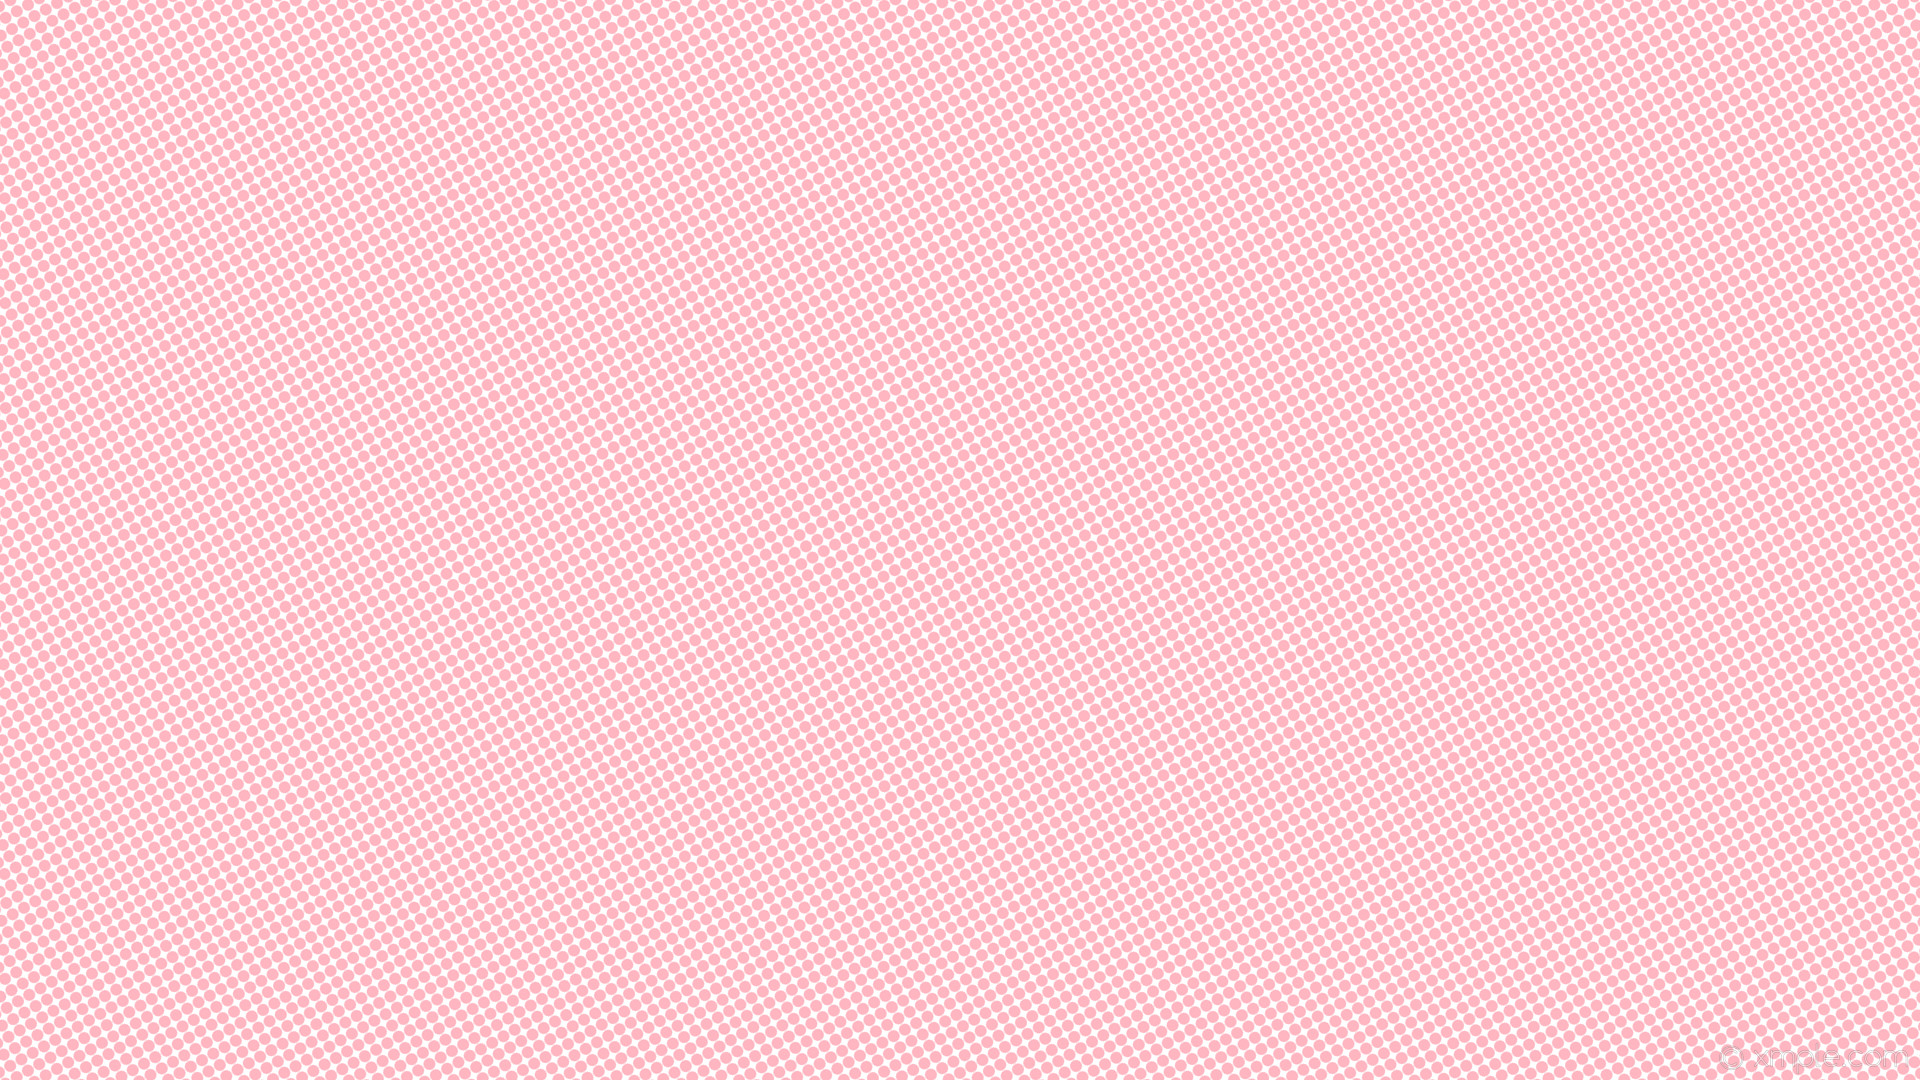 wallpaper white polka pink spots dots light pink #ffffff #ffb6c1 120° 12px  13px